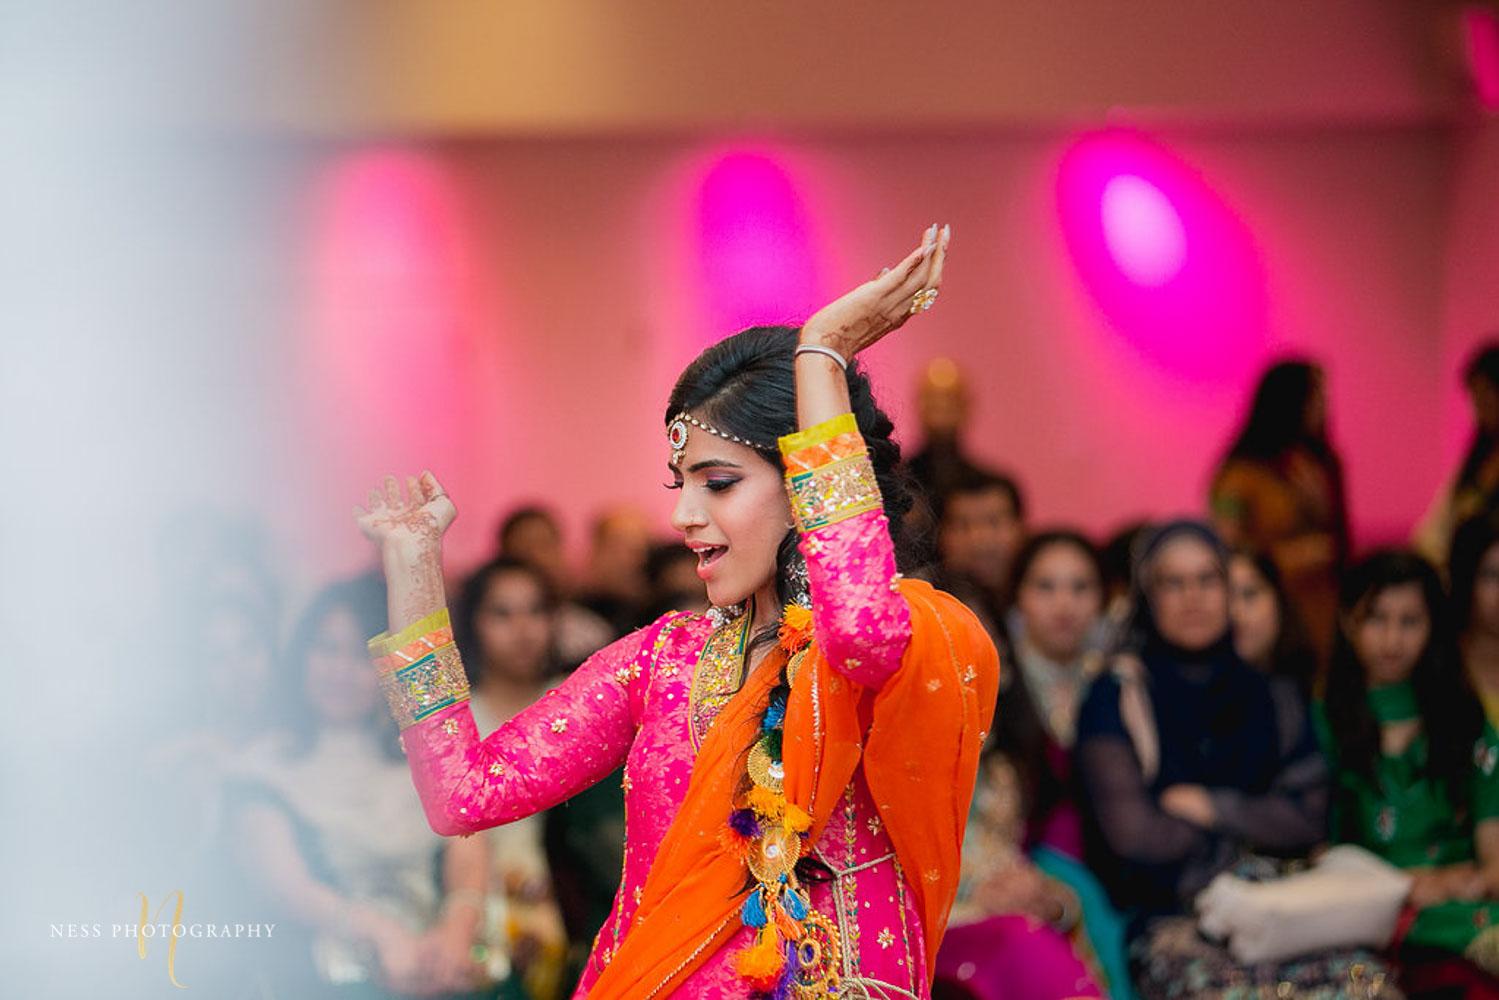 sister of the bride in pink shalwar kameez dancing at mehendi